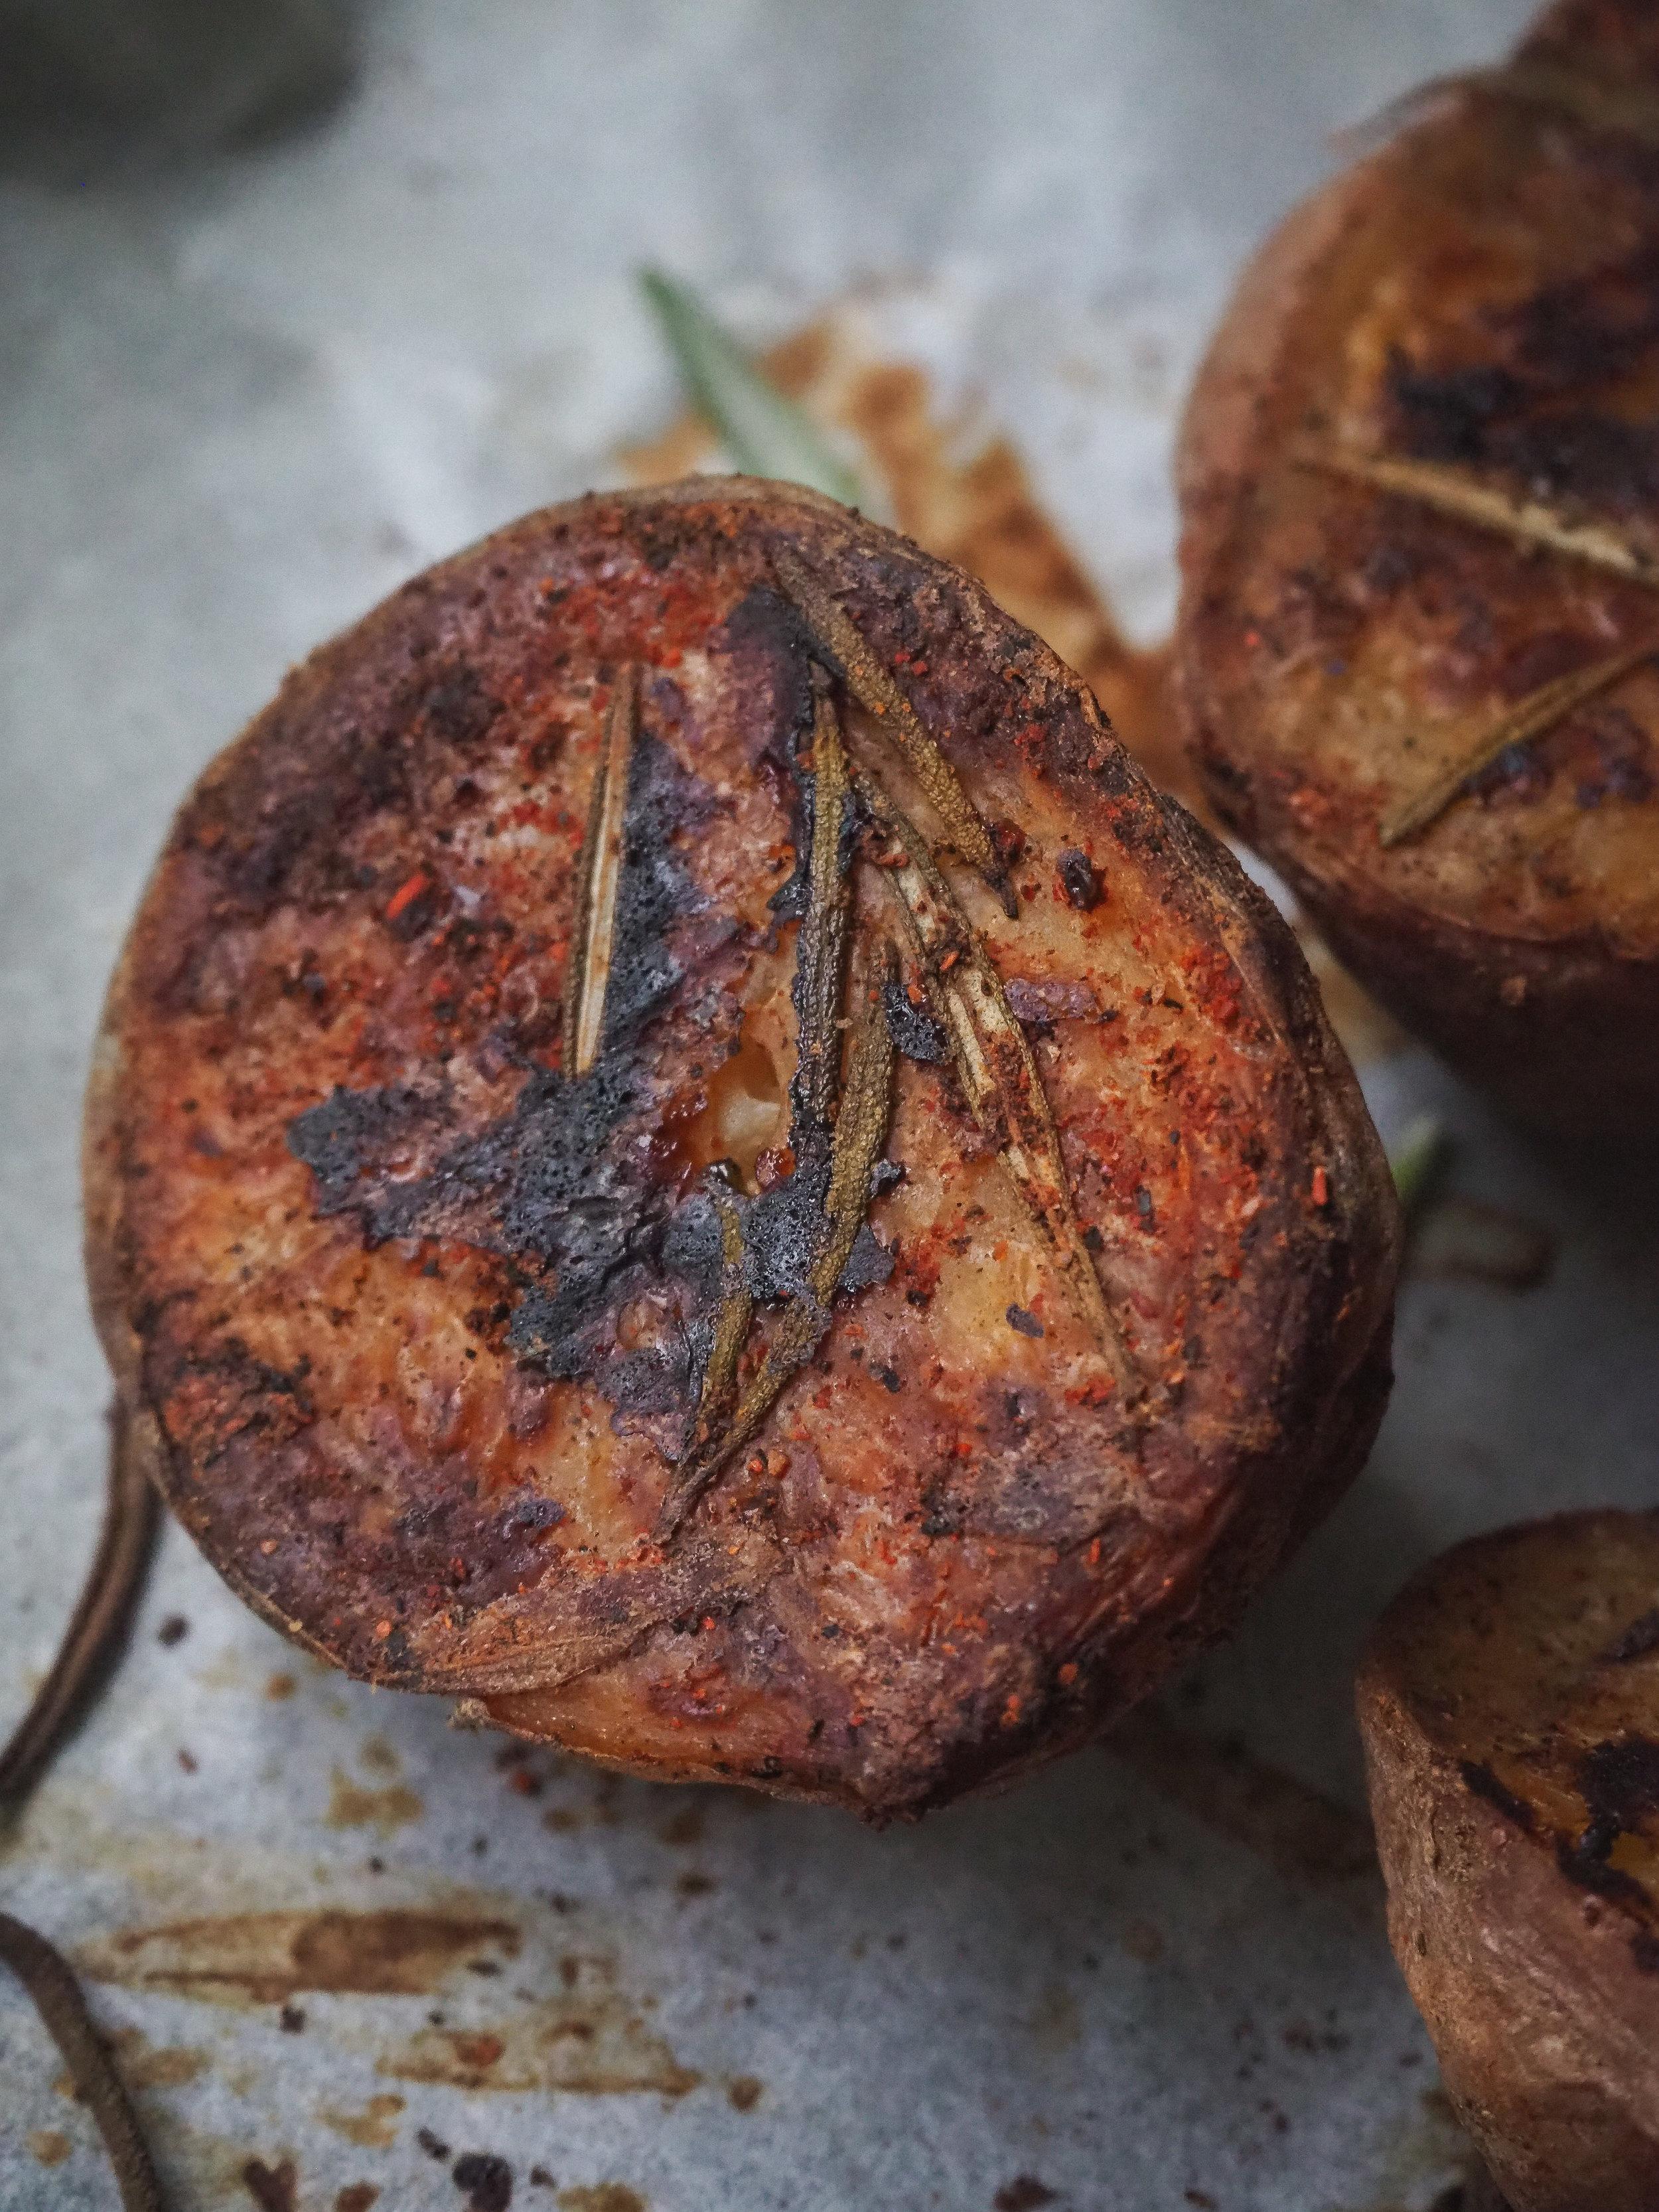 Roasted Rosemary Potatoes | Plant-Based, Vegan, Oil-Free, Easy Beginner Recipe  © Elena Hollenhorst